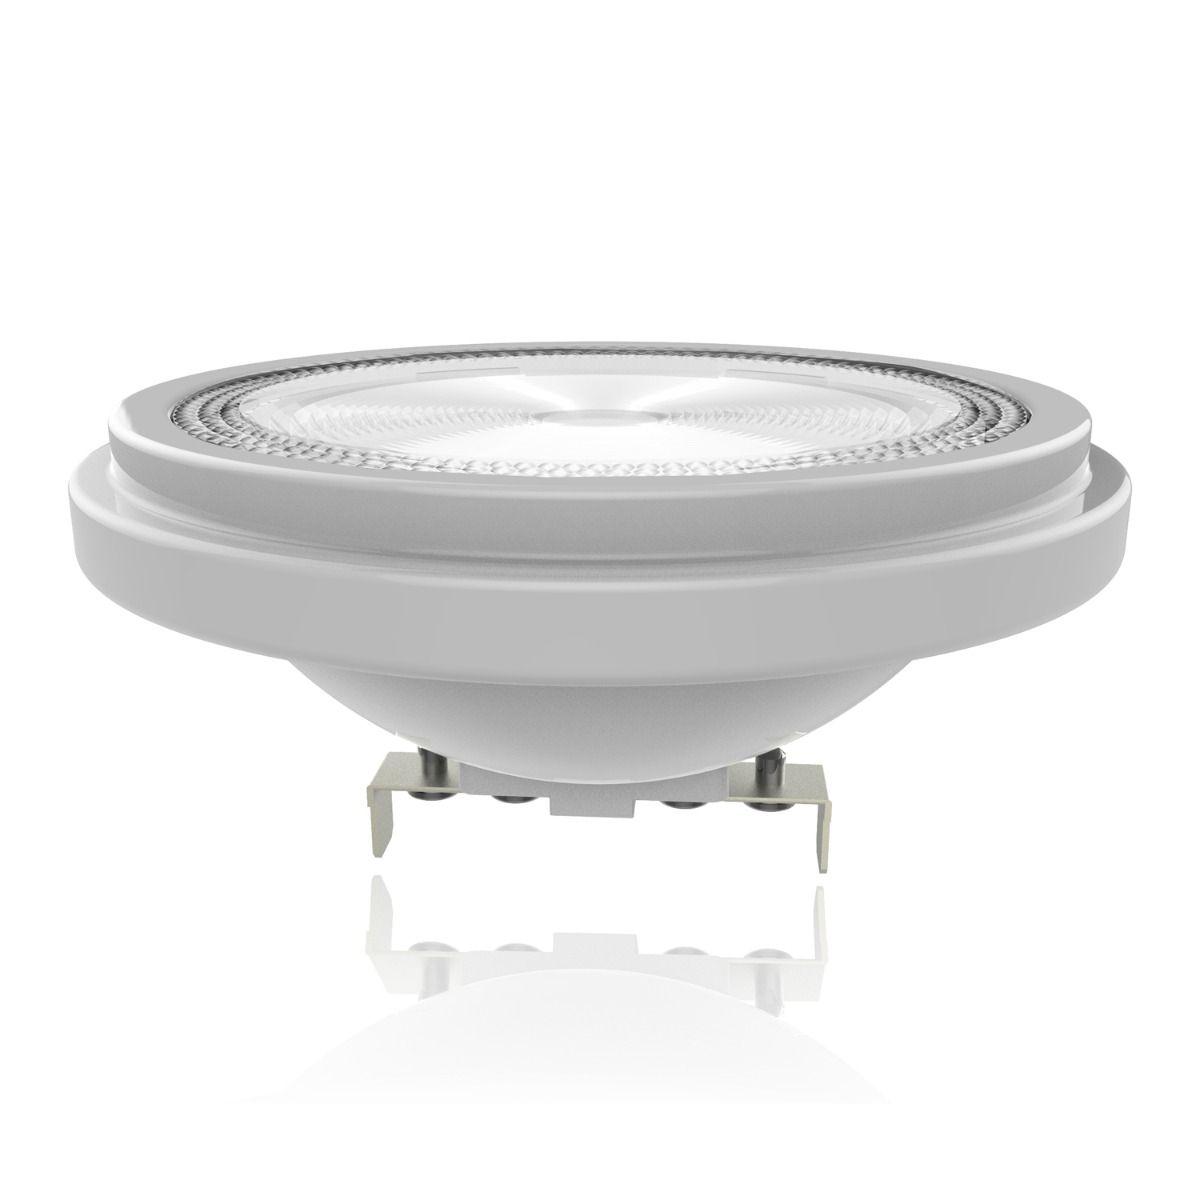 Noxion Lucent LED Spot AR111 G53 12V 11.5W 930 40D | Dimmable - Best Colour Rendering - Replaces 75W